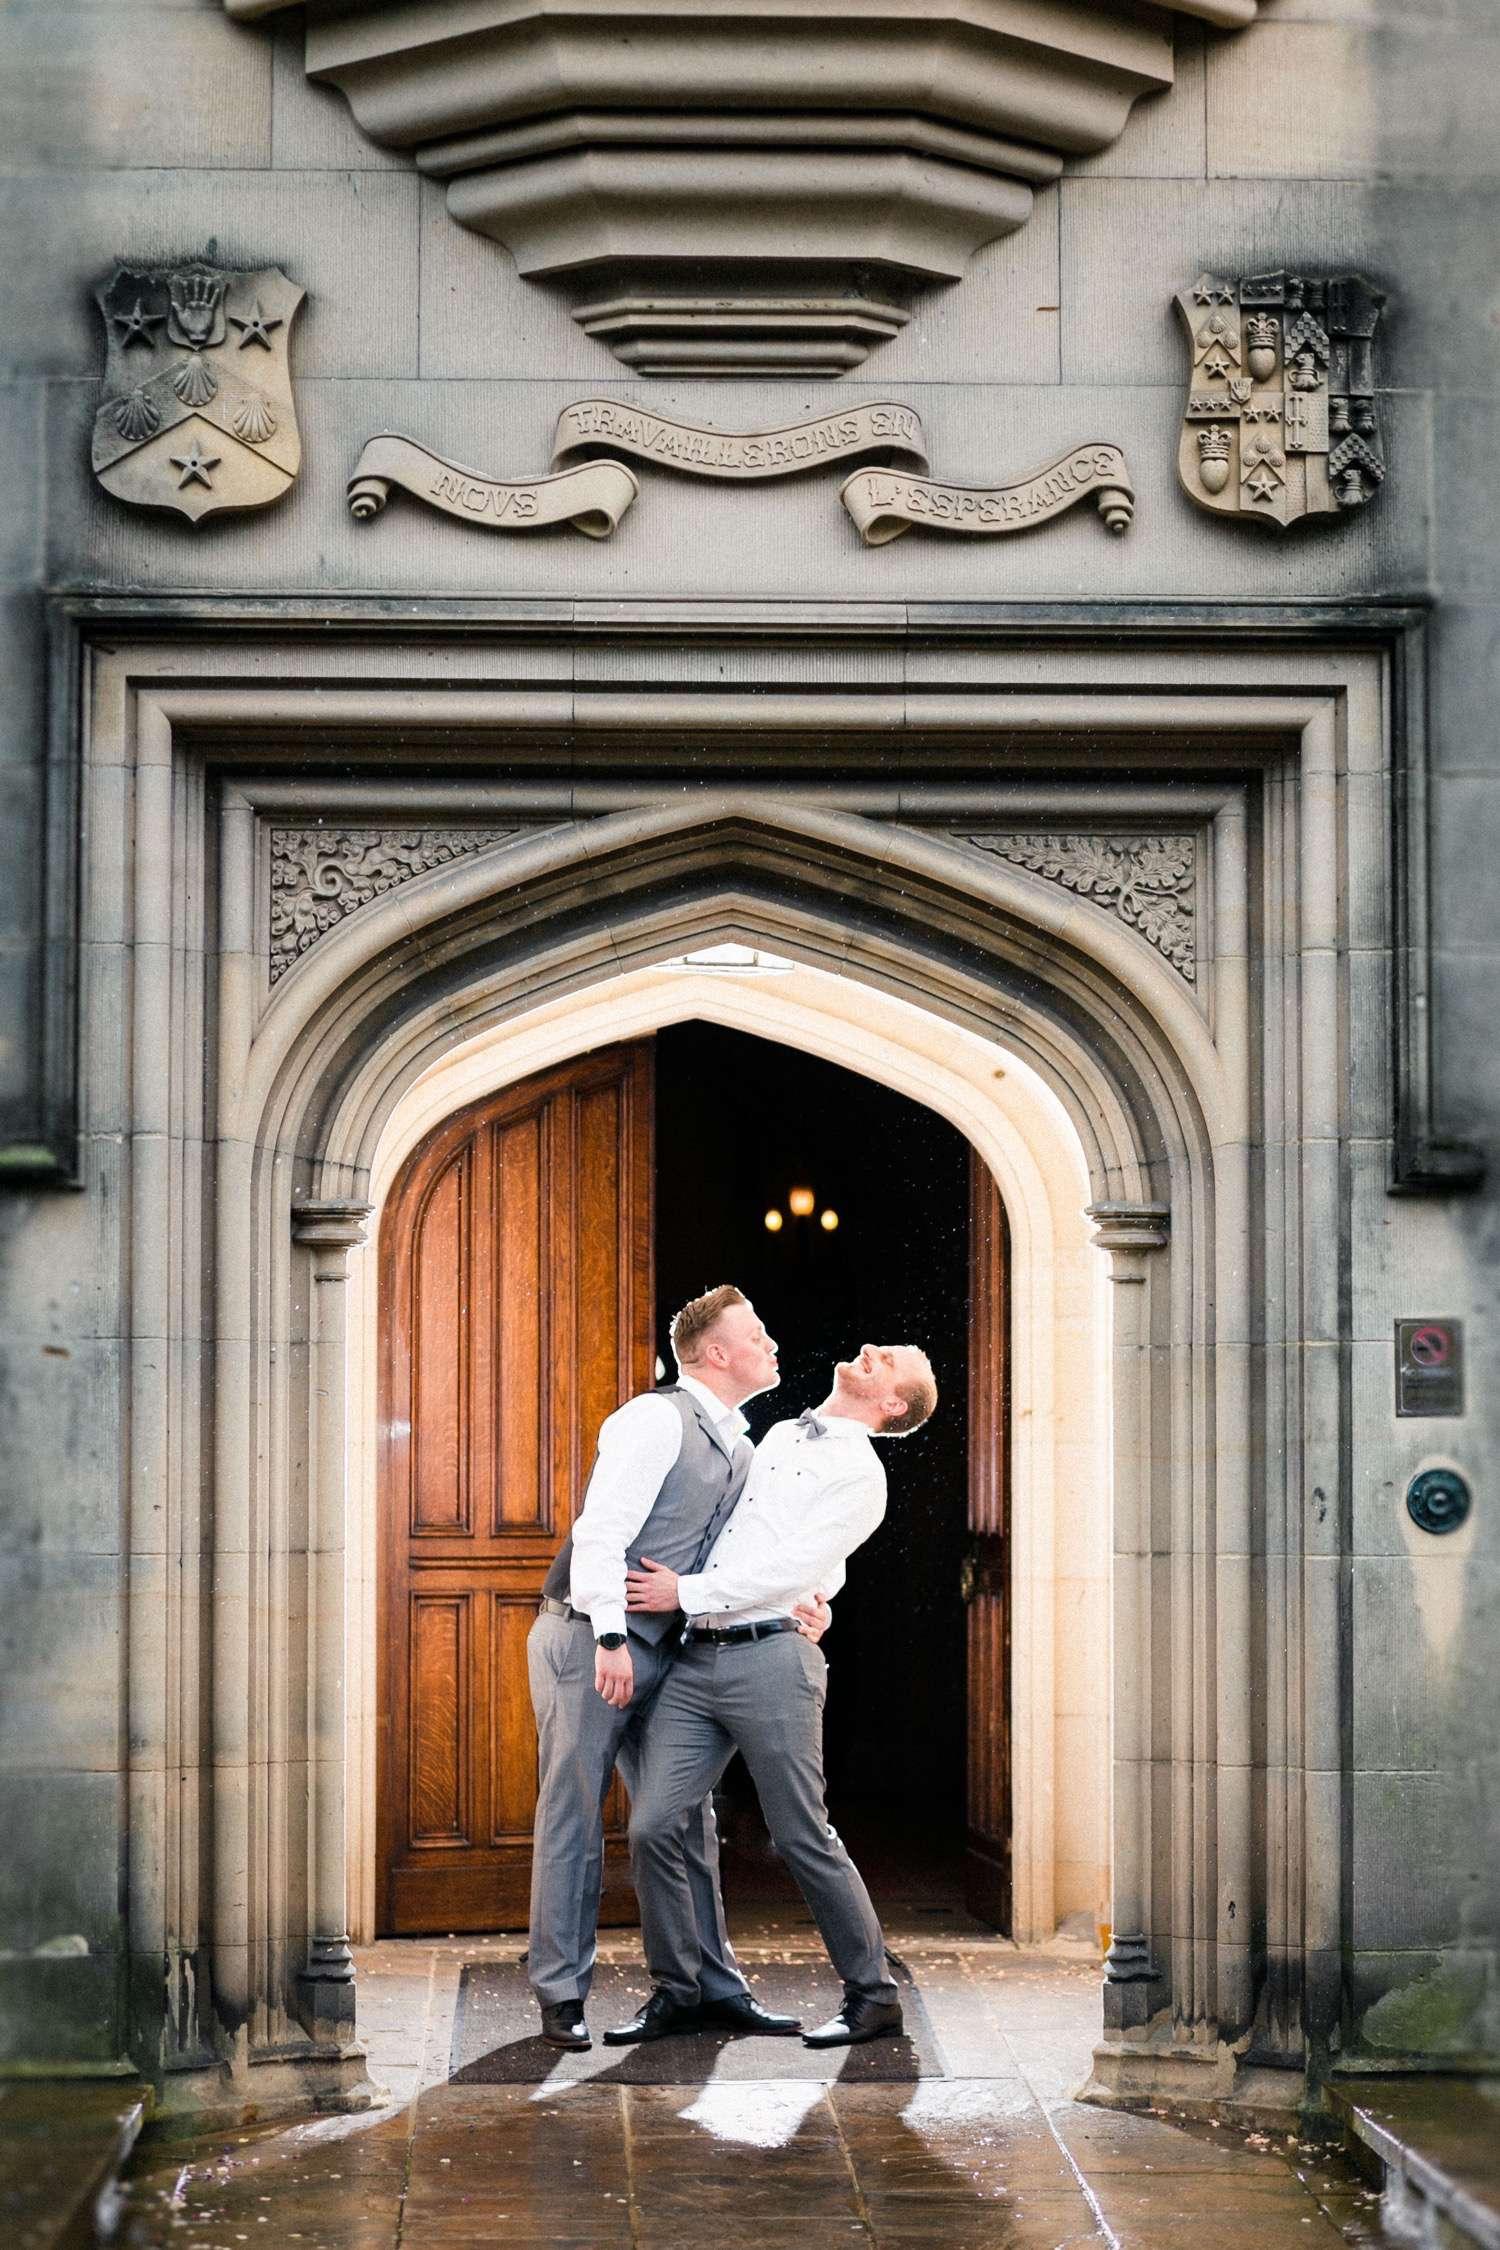 Stylish-Wedding-Photographer-Paul-Liddement-Wedding-Stories-47.jpg